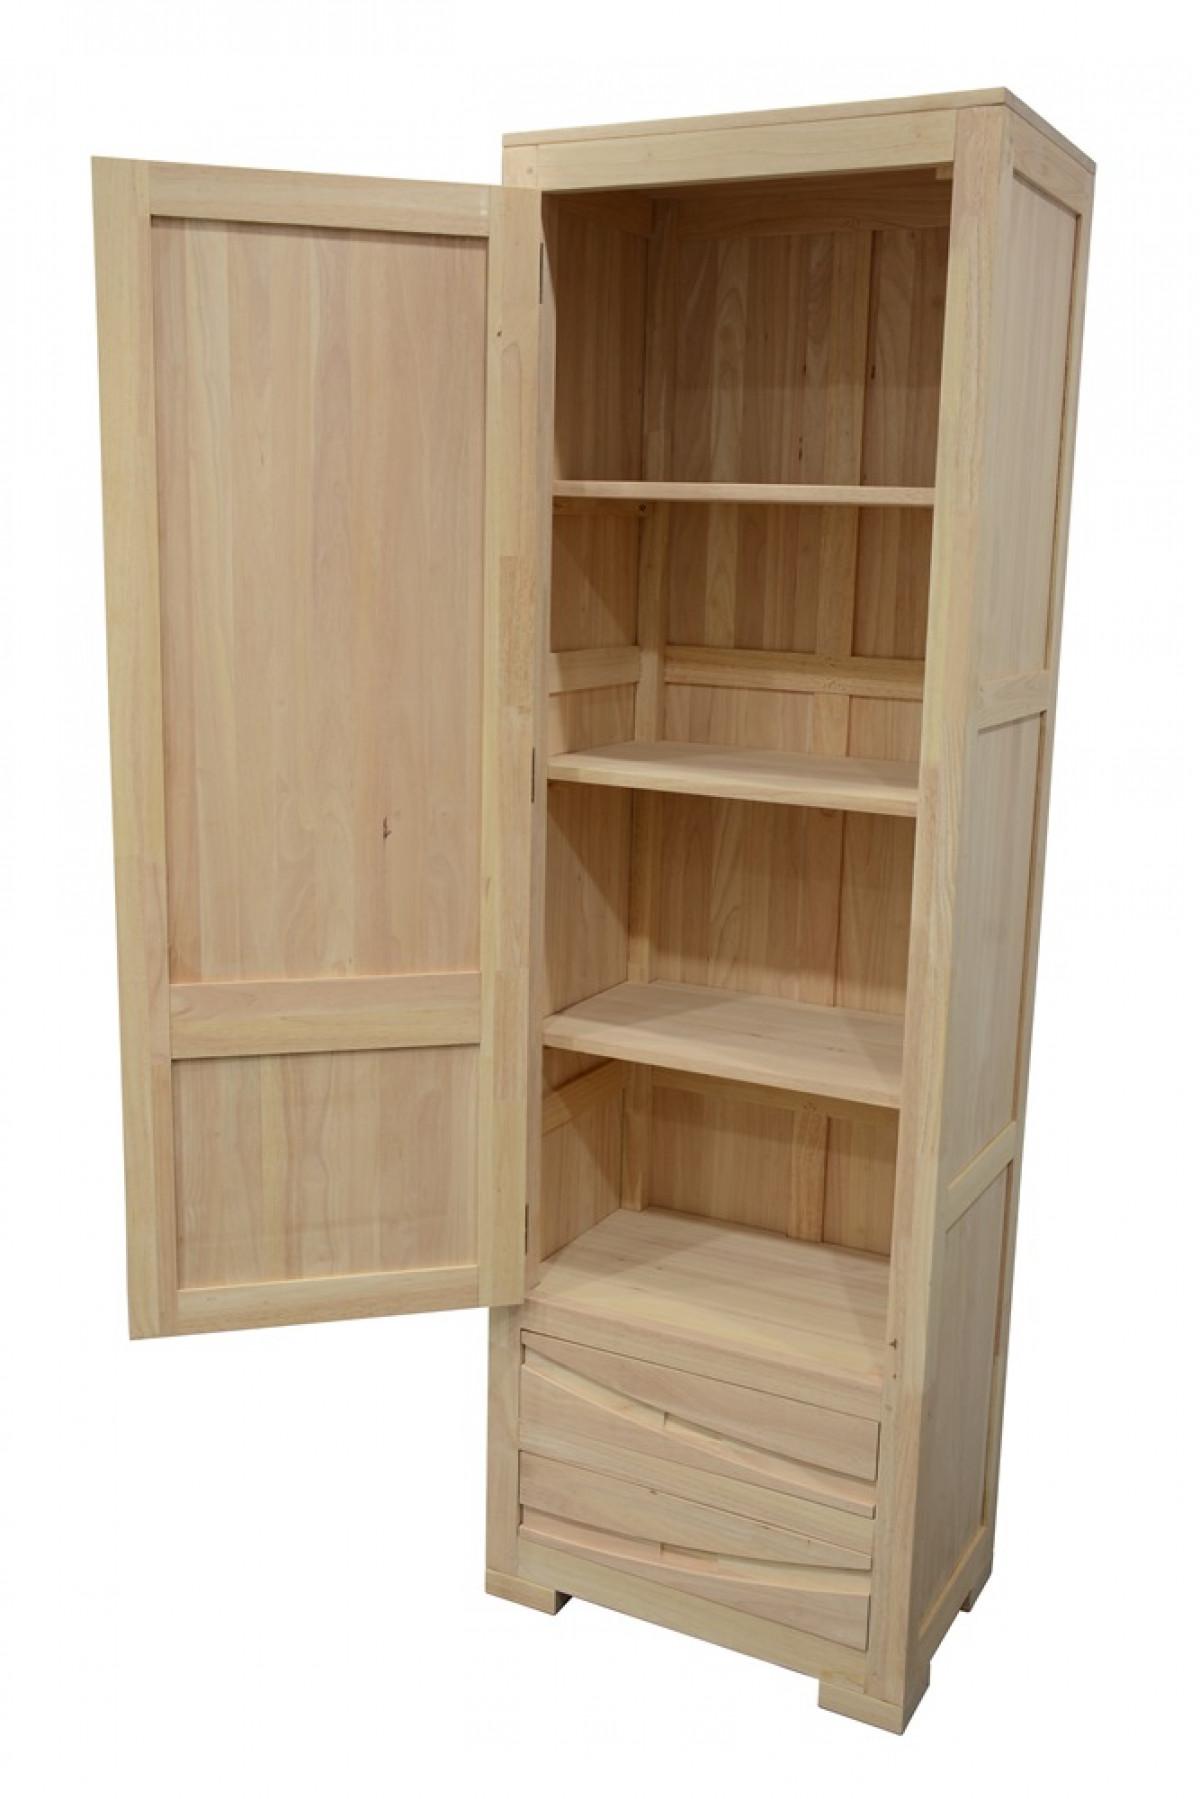 armoire bois 1 porte wakae